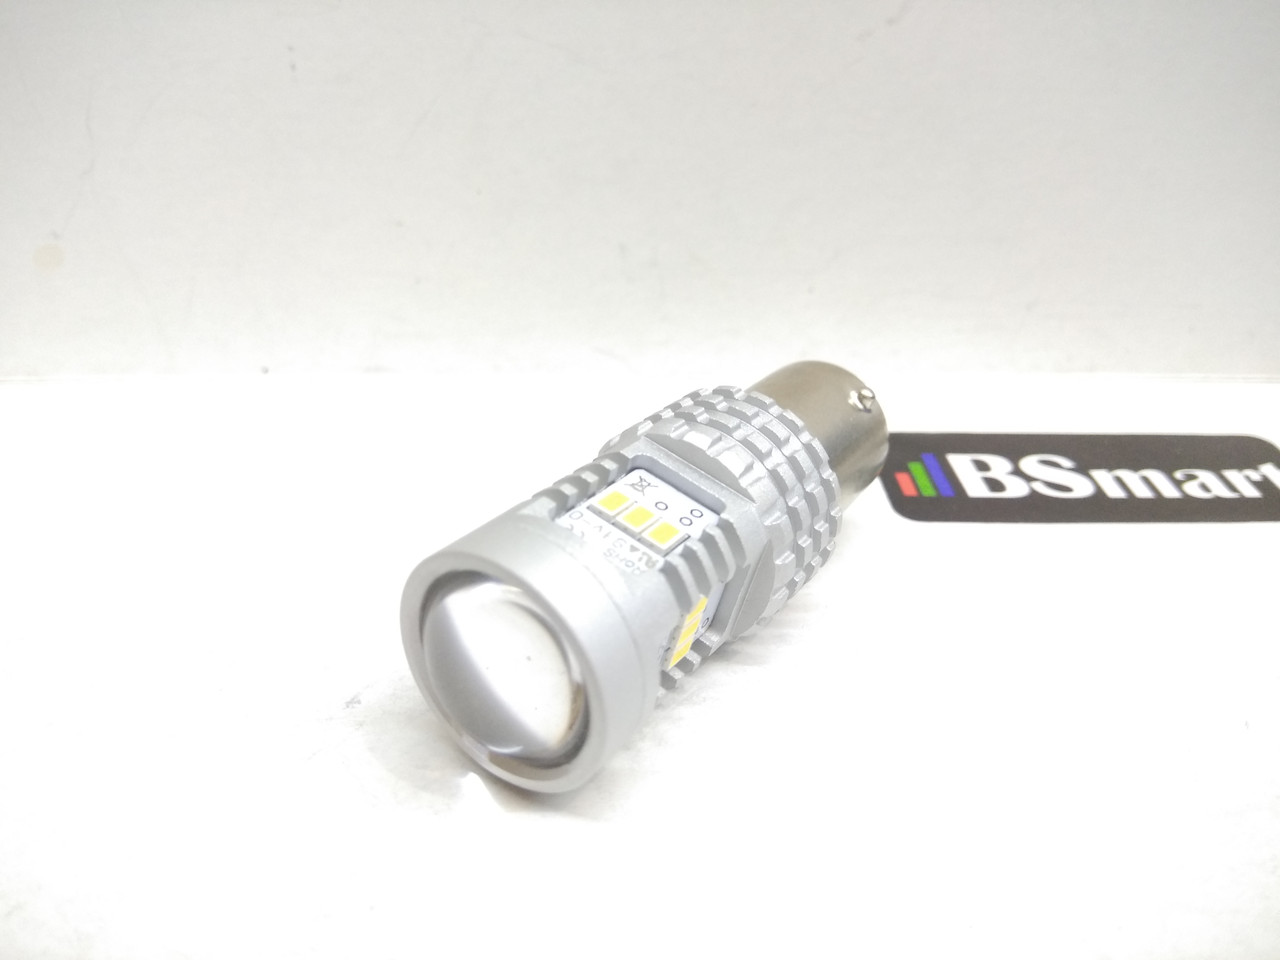 Автолампа LED, P21W, 1156, 14 SMD 2030, 9-16V, Белая